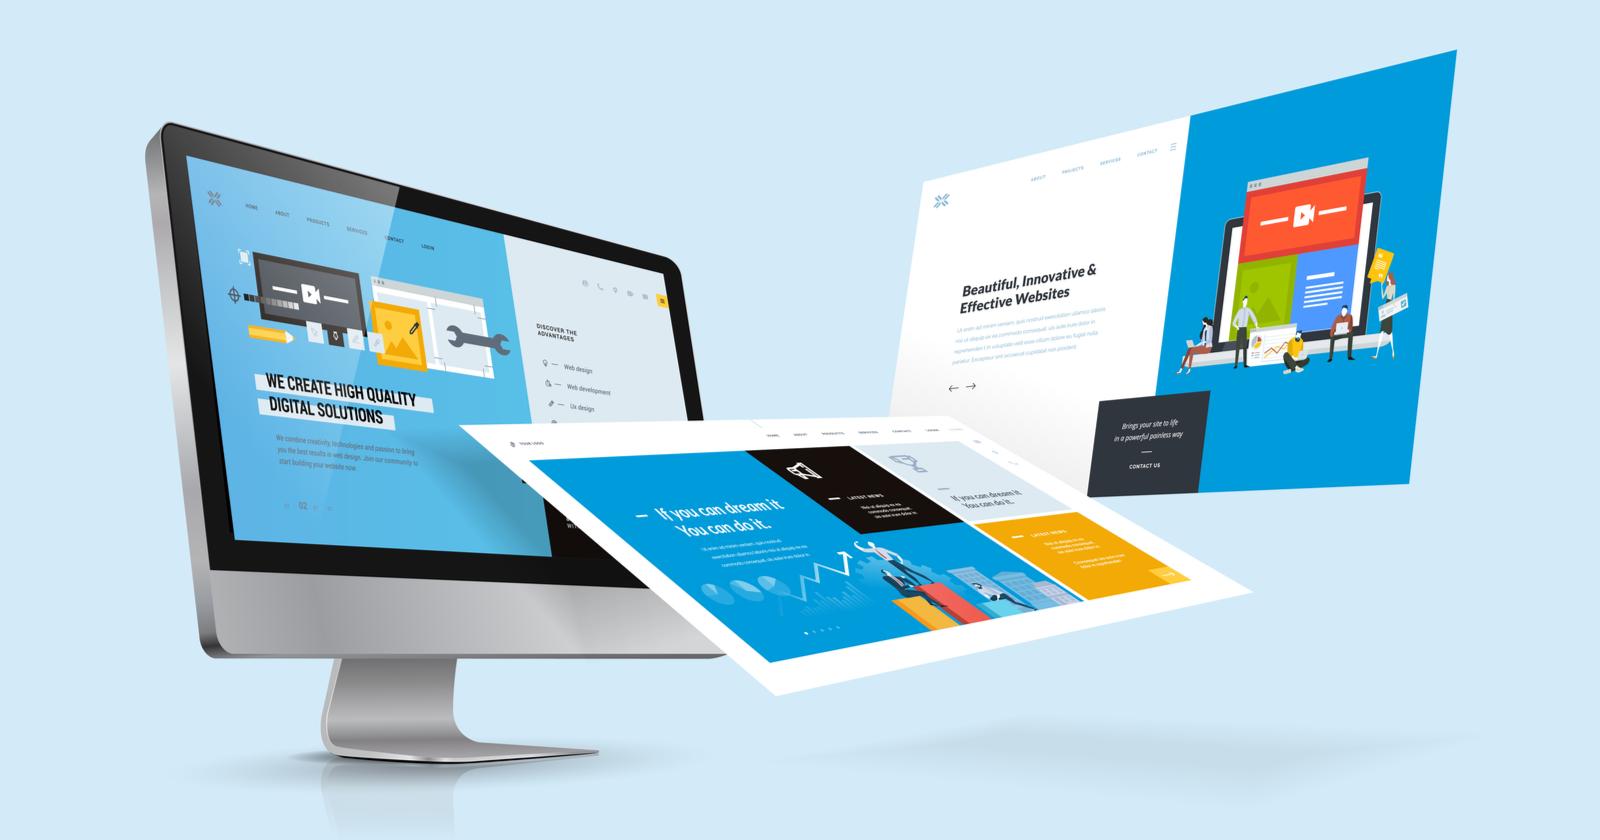 5 Ways SEO & Web Design Go Together